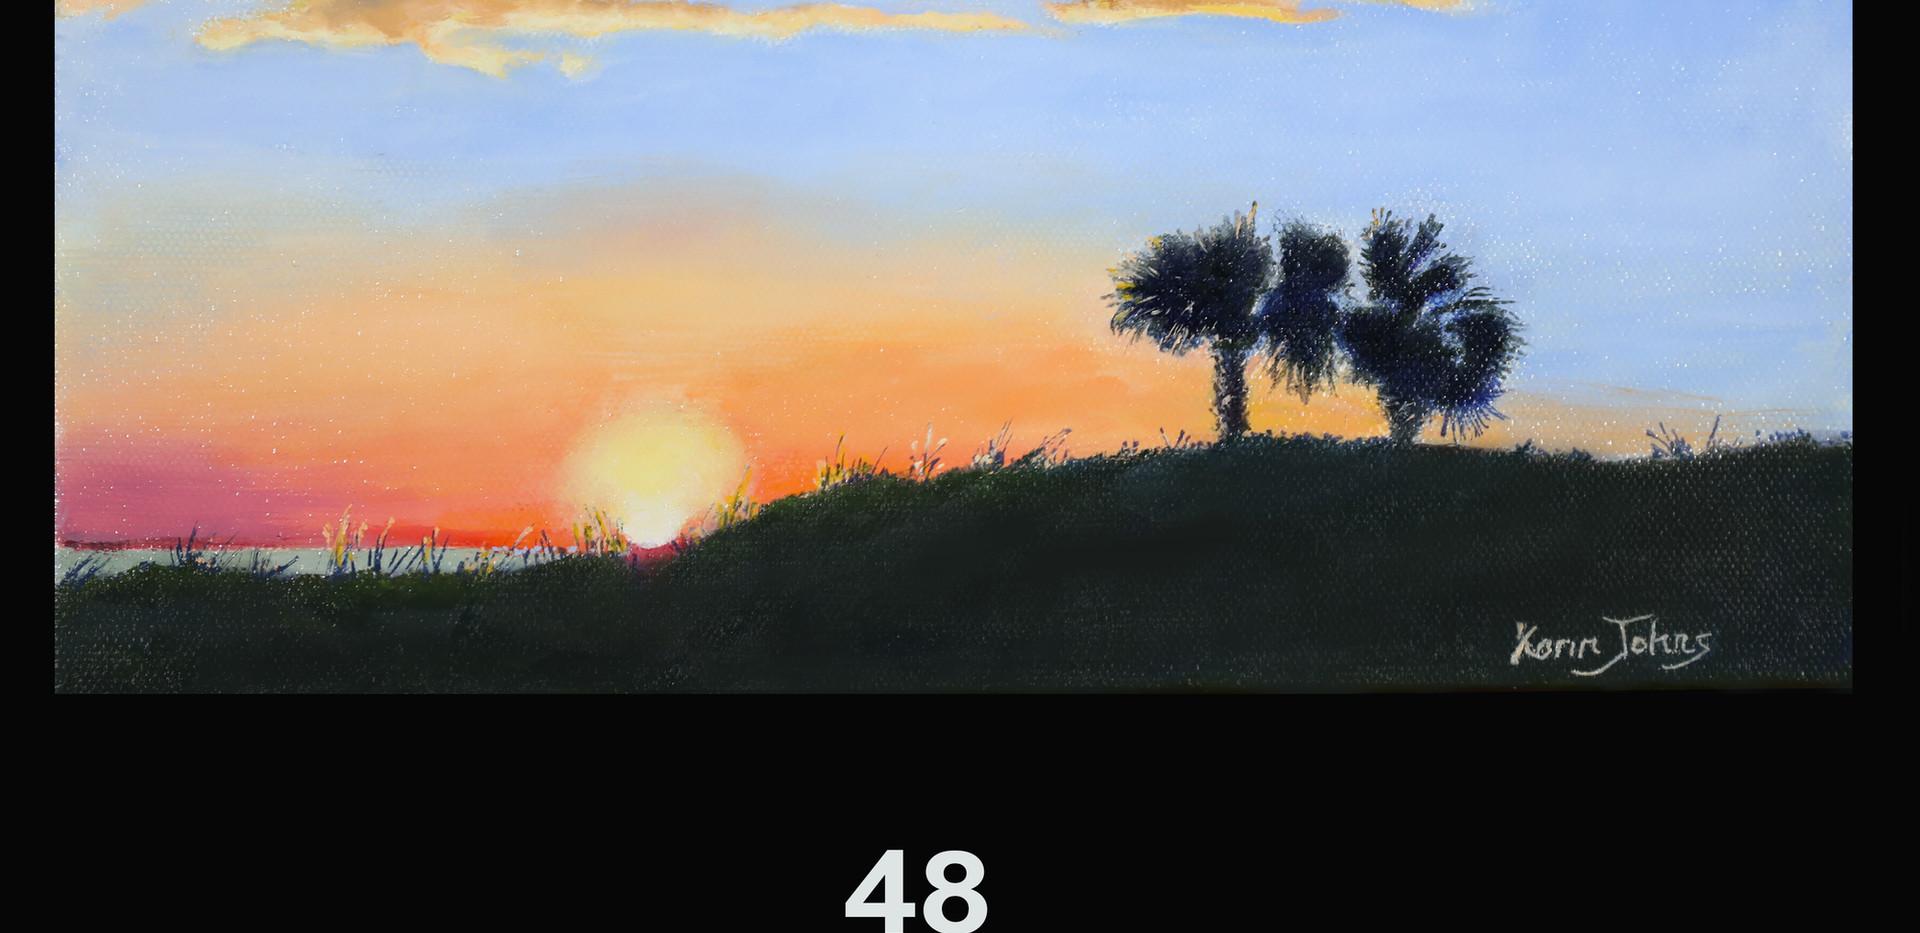 48. Sunset at the Gulf